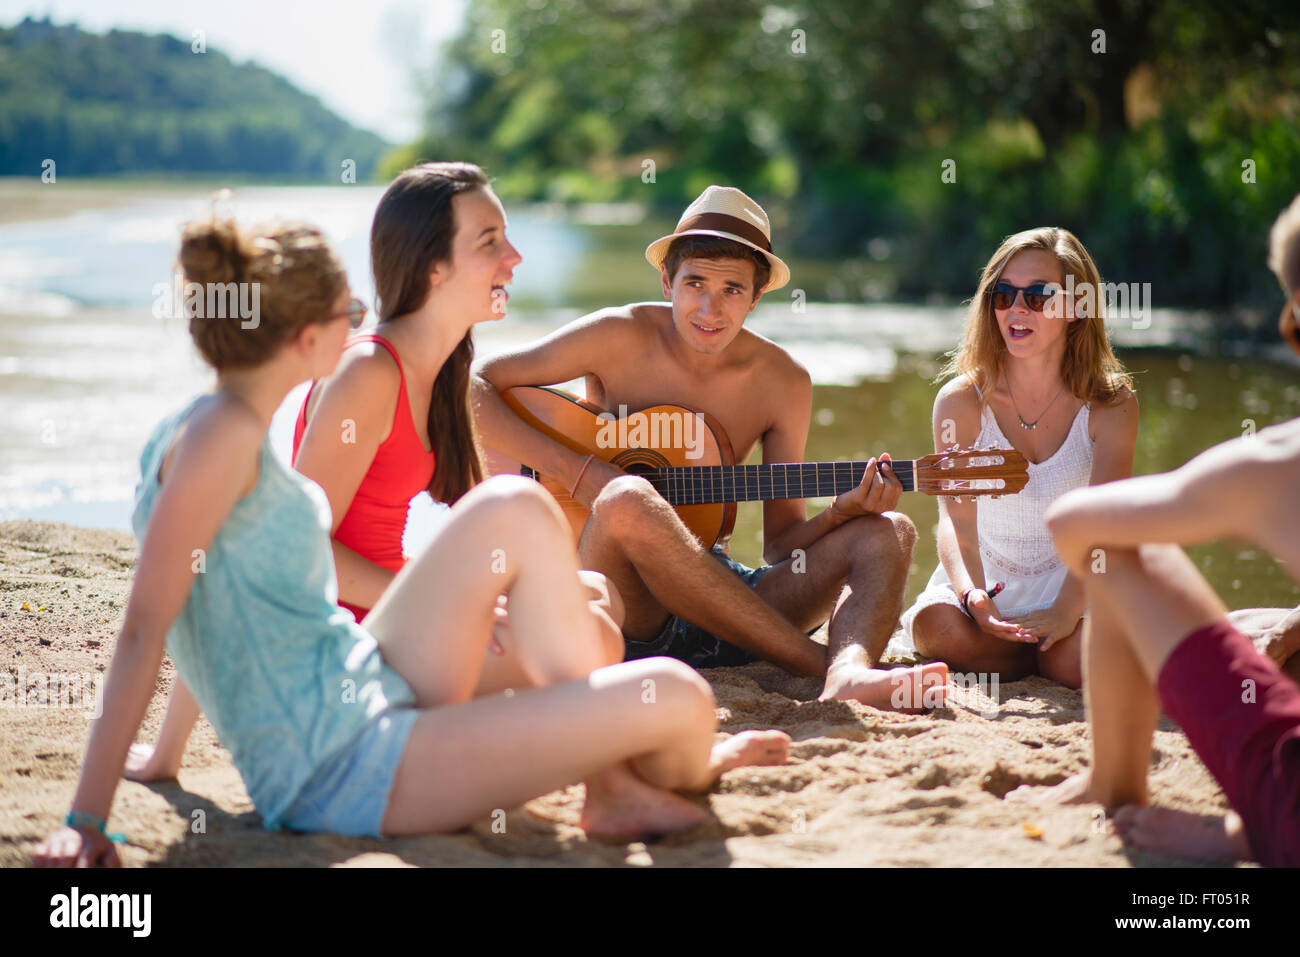 Junge Teenager am nackten Strand